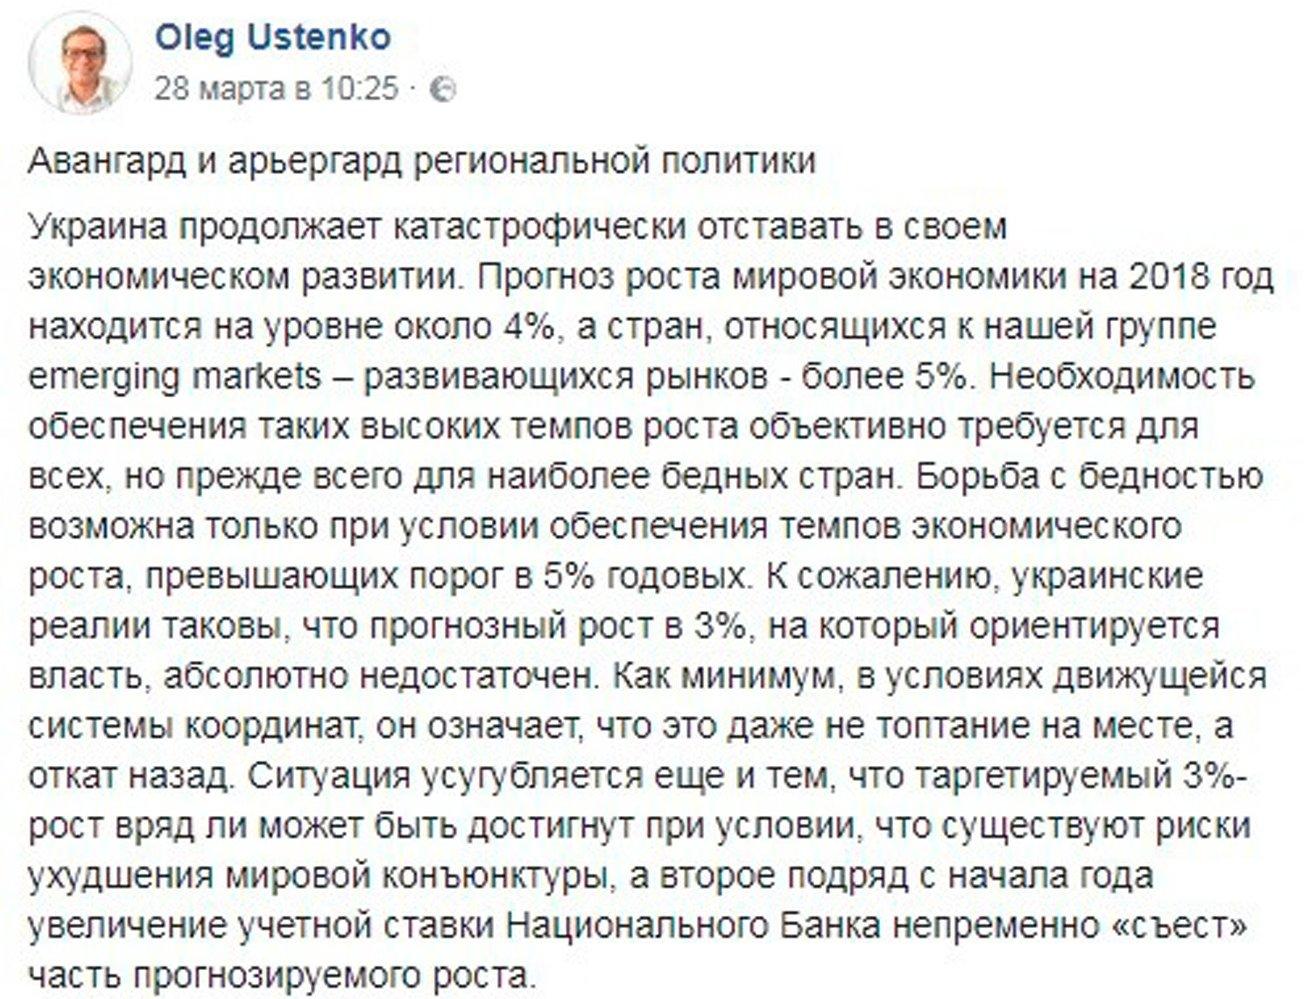 olegustenko_